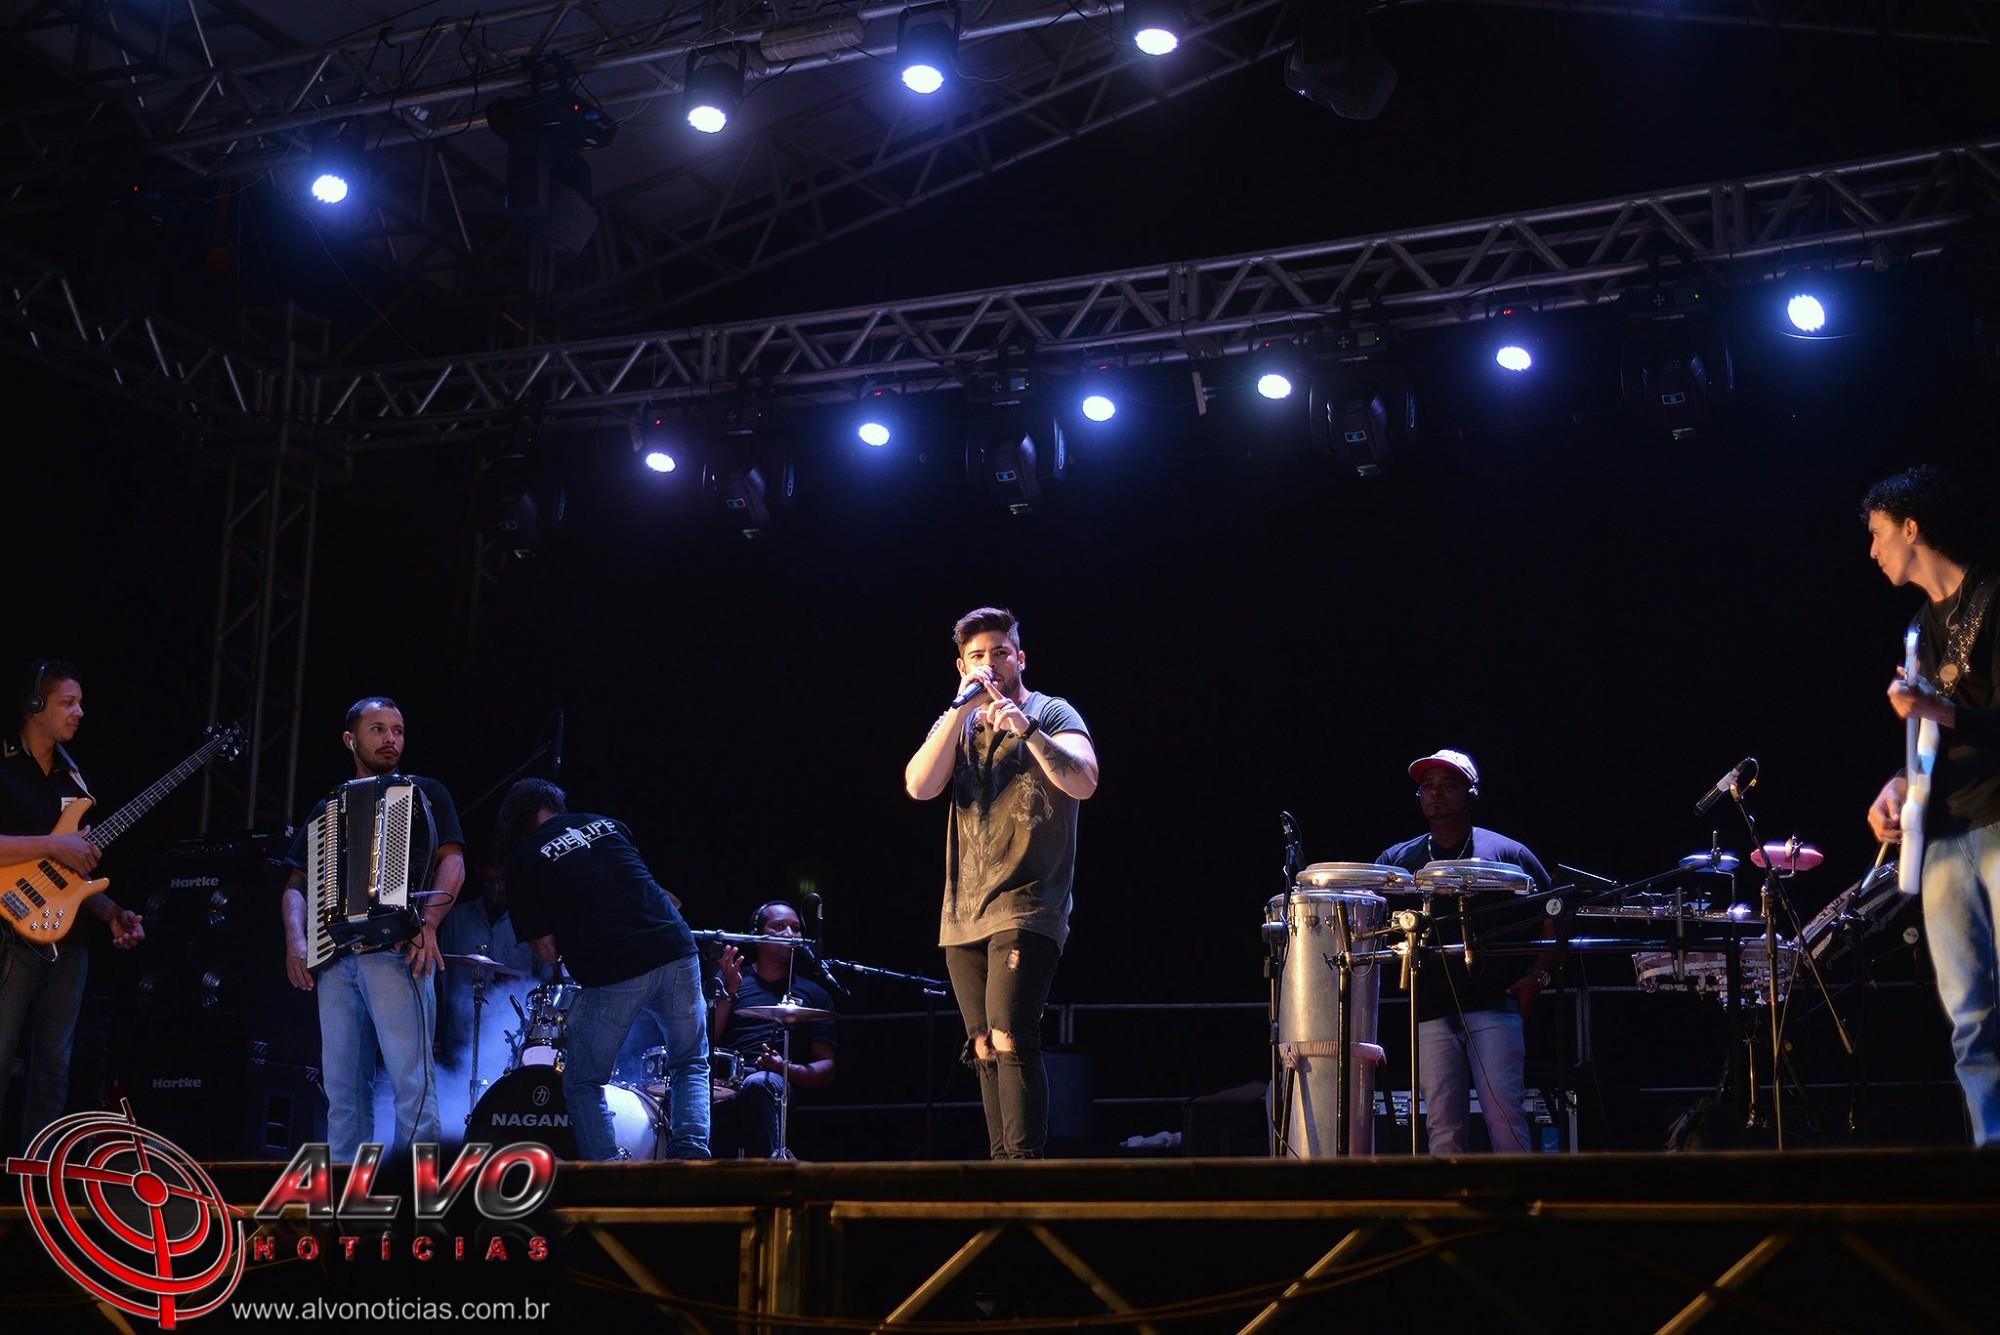 EXPOALVO 2017 - SÁBADO